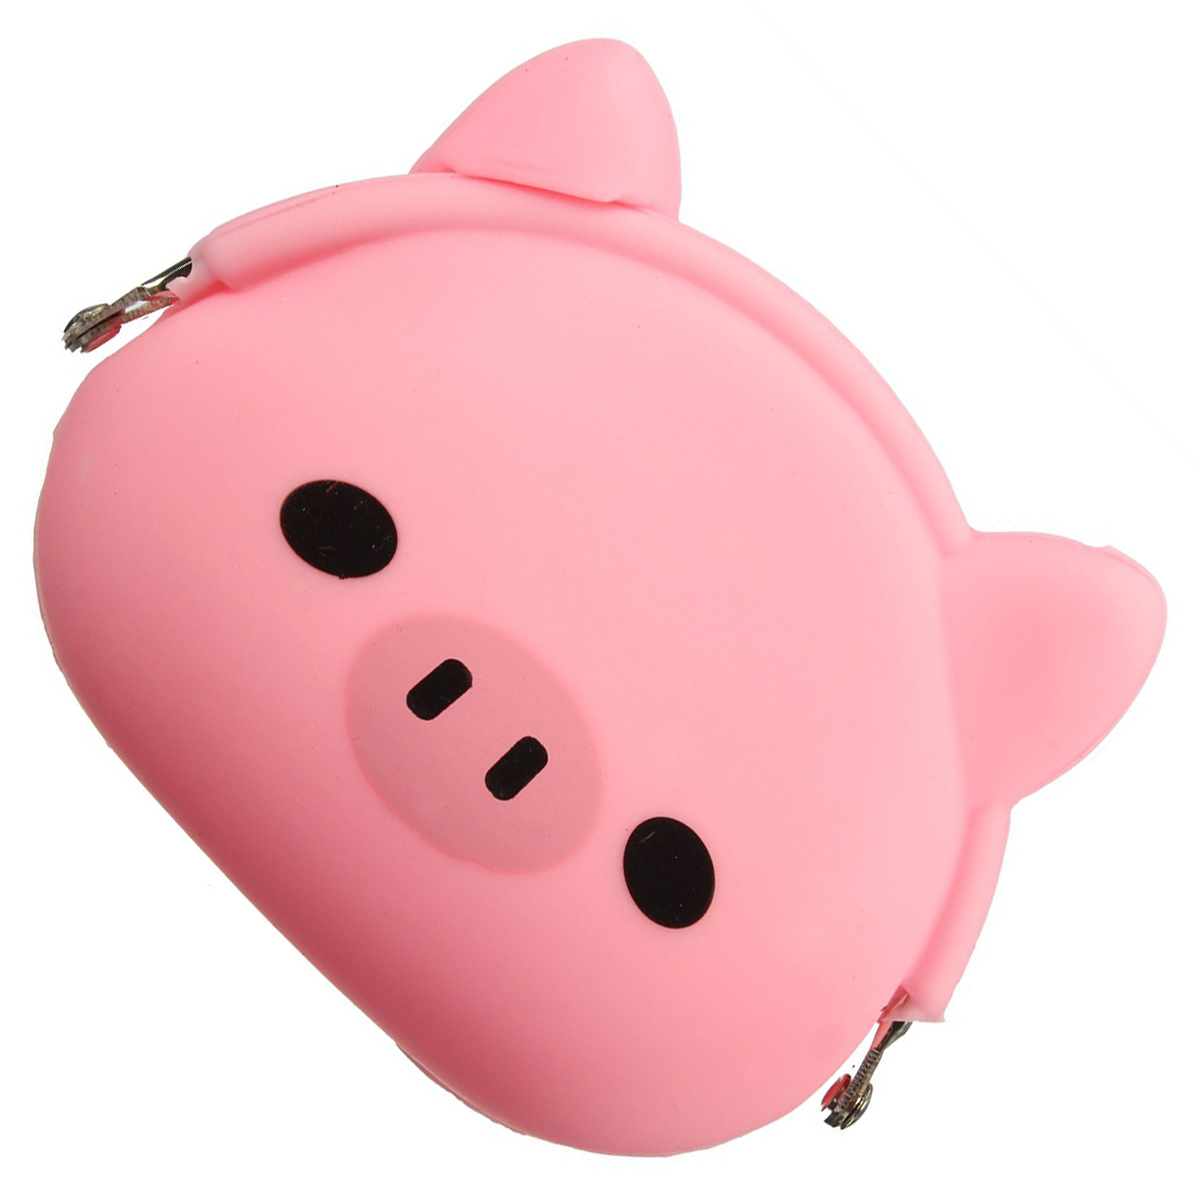 FGGS-Women Girls Wallet Kawaii Cute Cartoon Animal Silicone Jelly Coin Bag Purse Kids Gift Pink Pig asds women girls wallet kawaii cute cartoon animal silicone jelly coin bag purse kids gift huskies